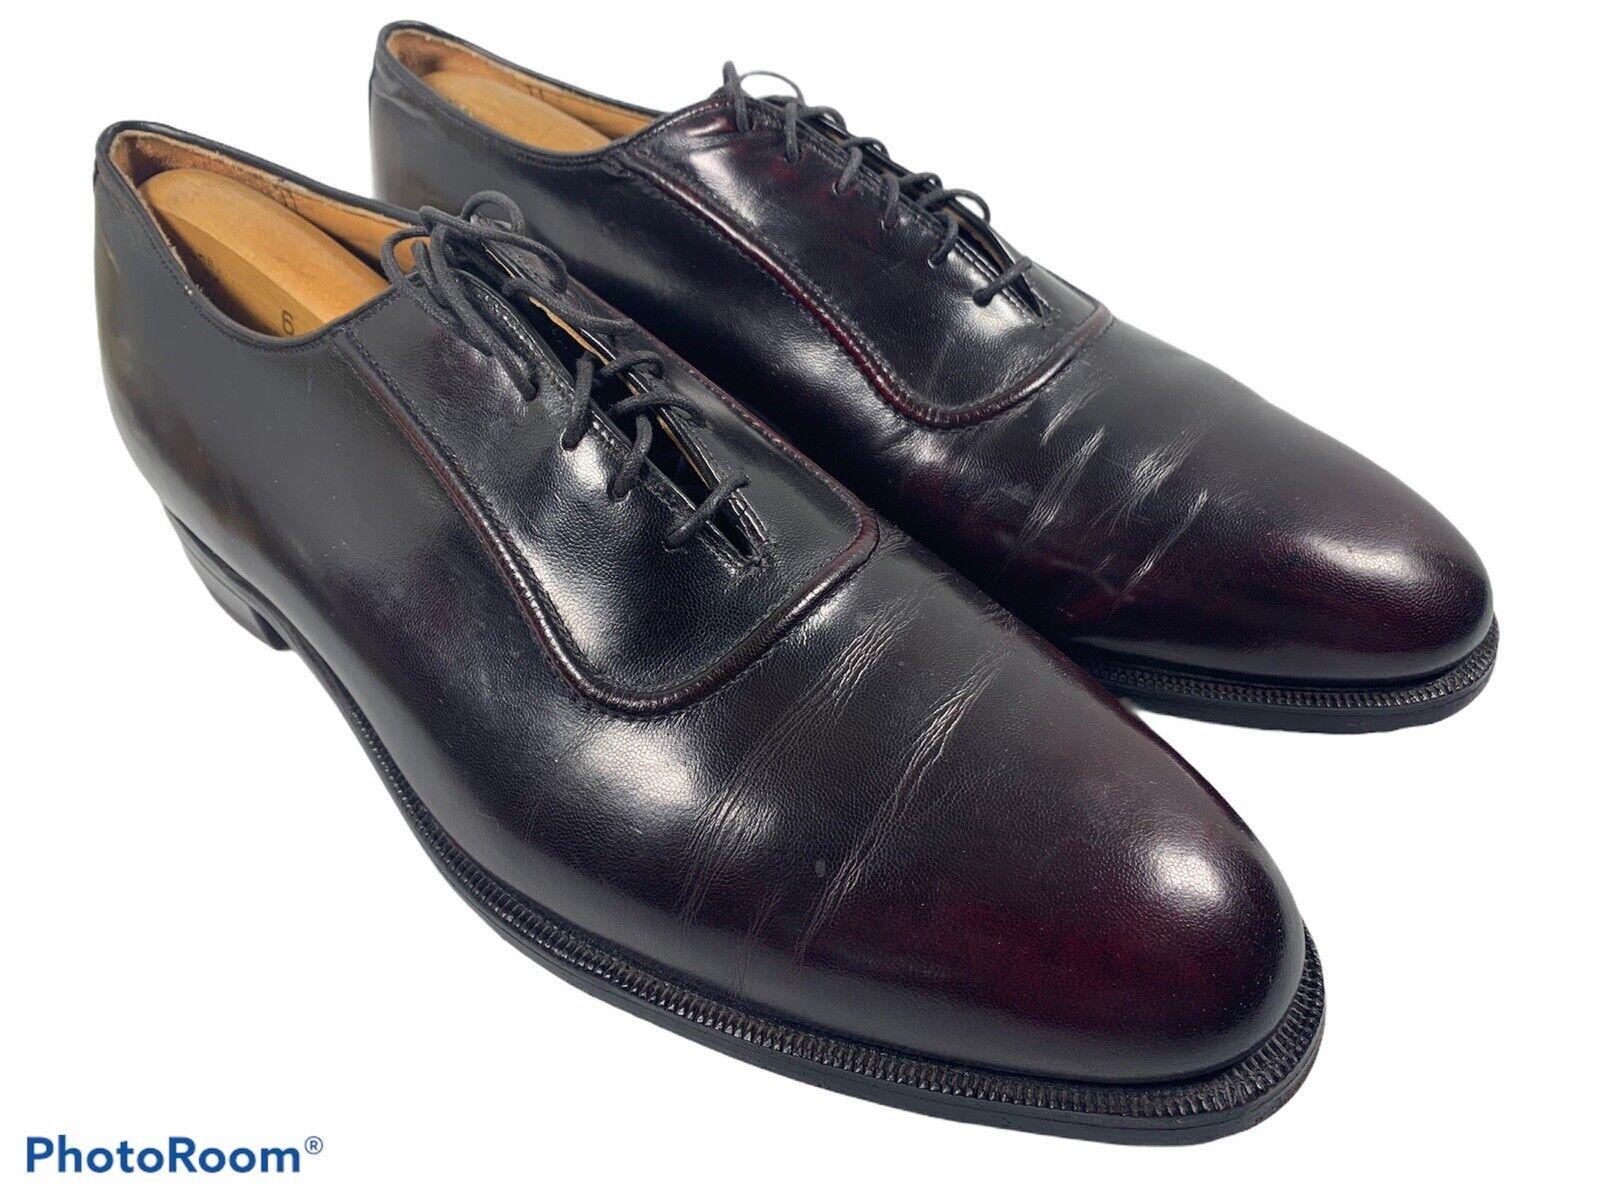 🔥 Johnston Murphy Aristocraft Brown Plain Toe Leather Shoes Men's Sz 12 B •Nice